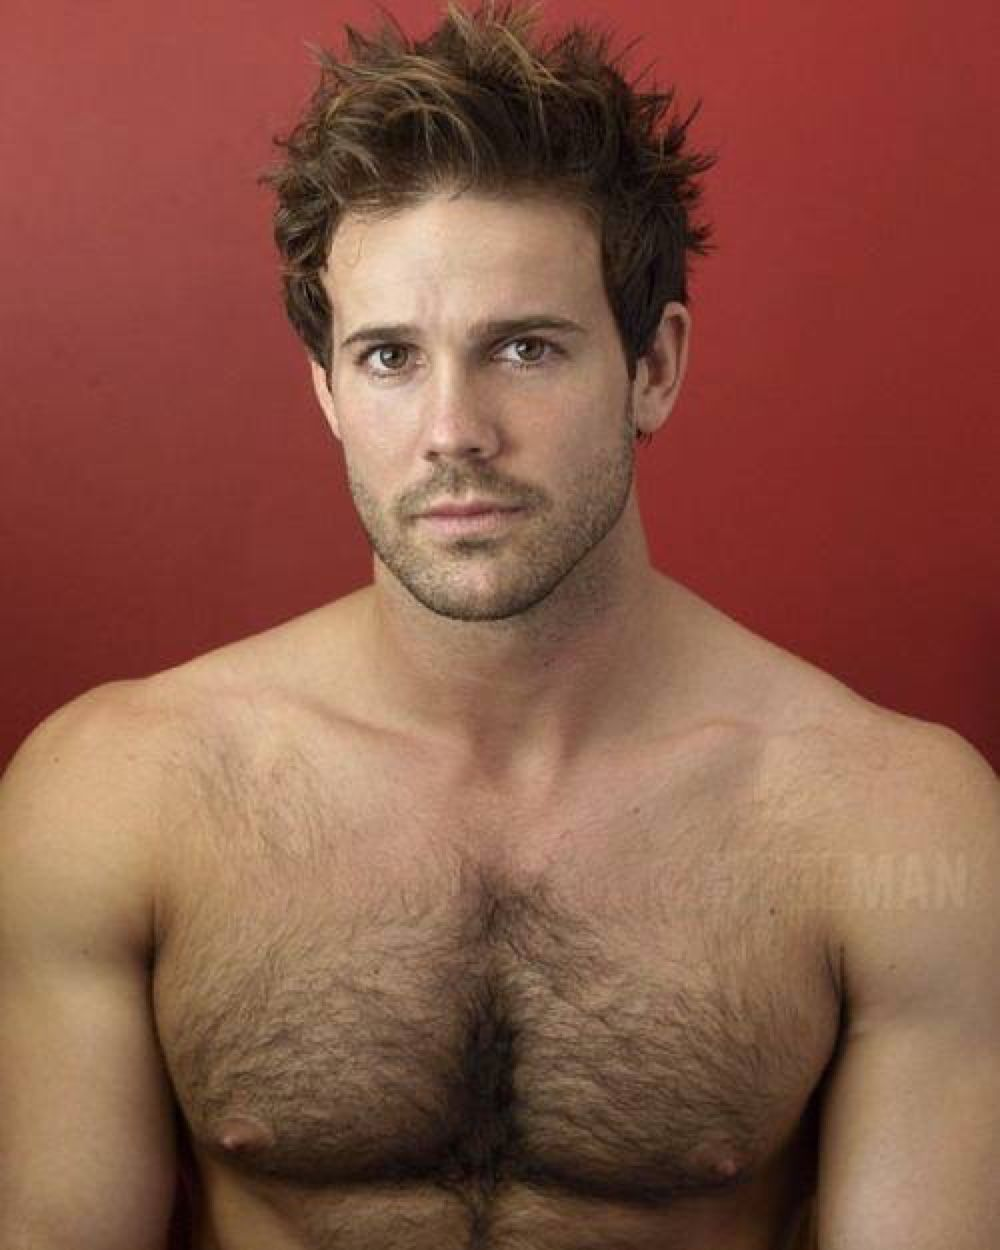 Beaux hommes nus tumblr